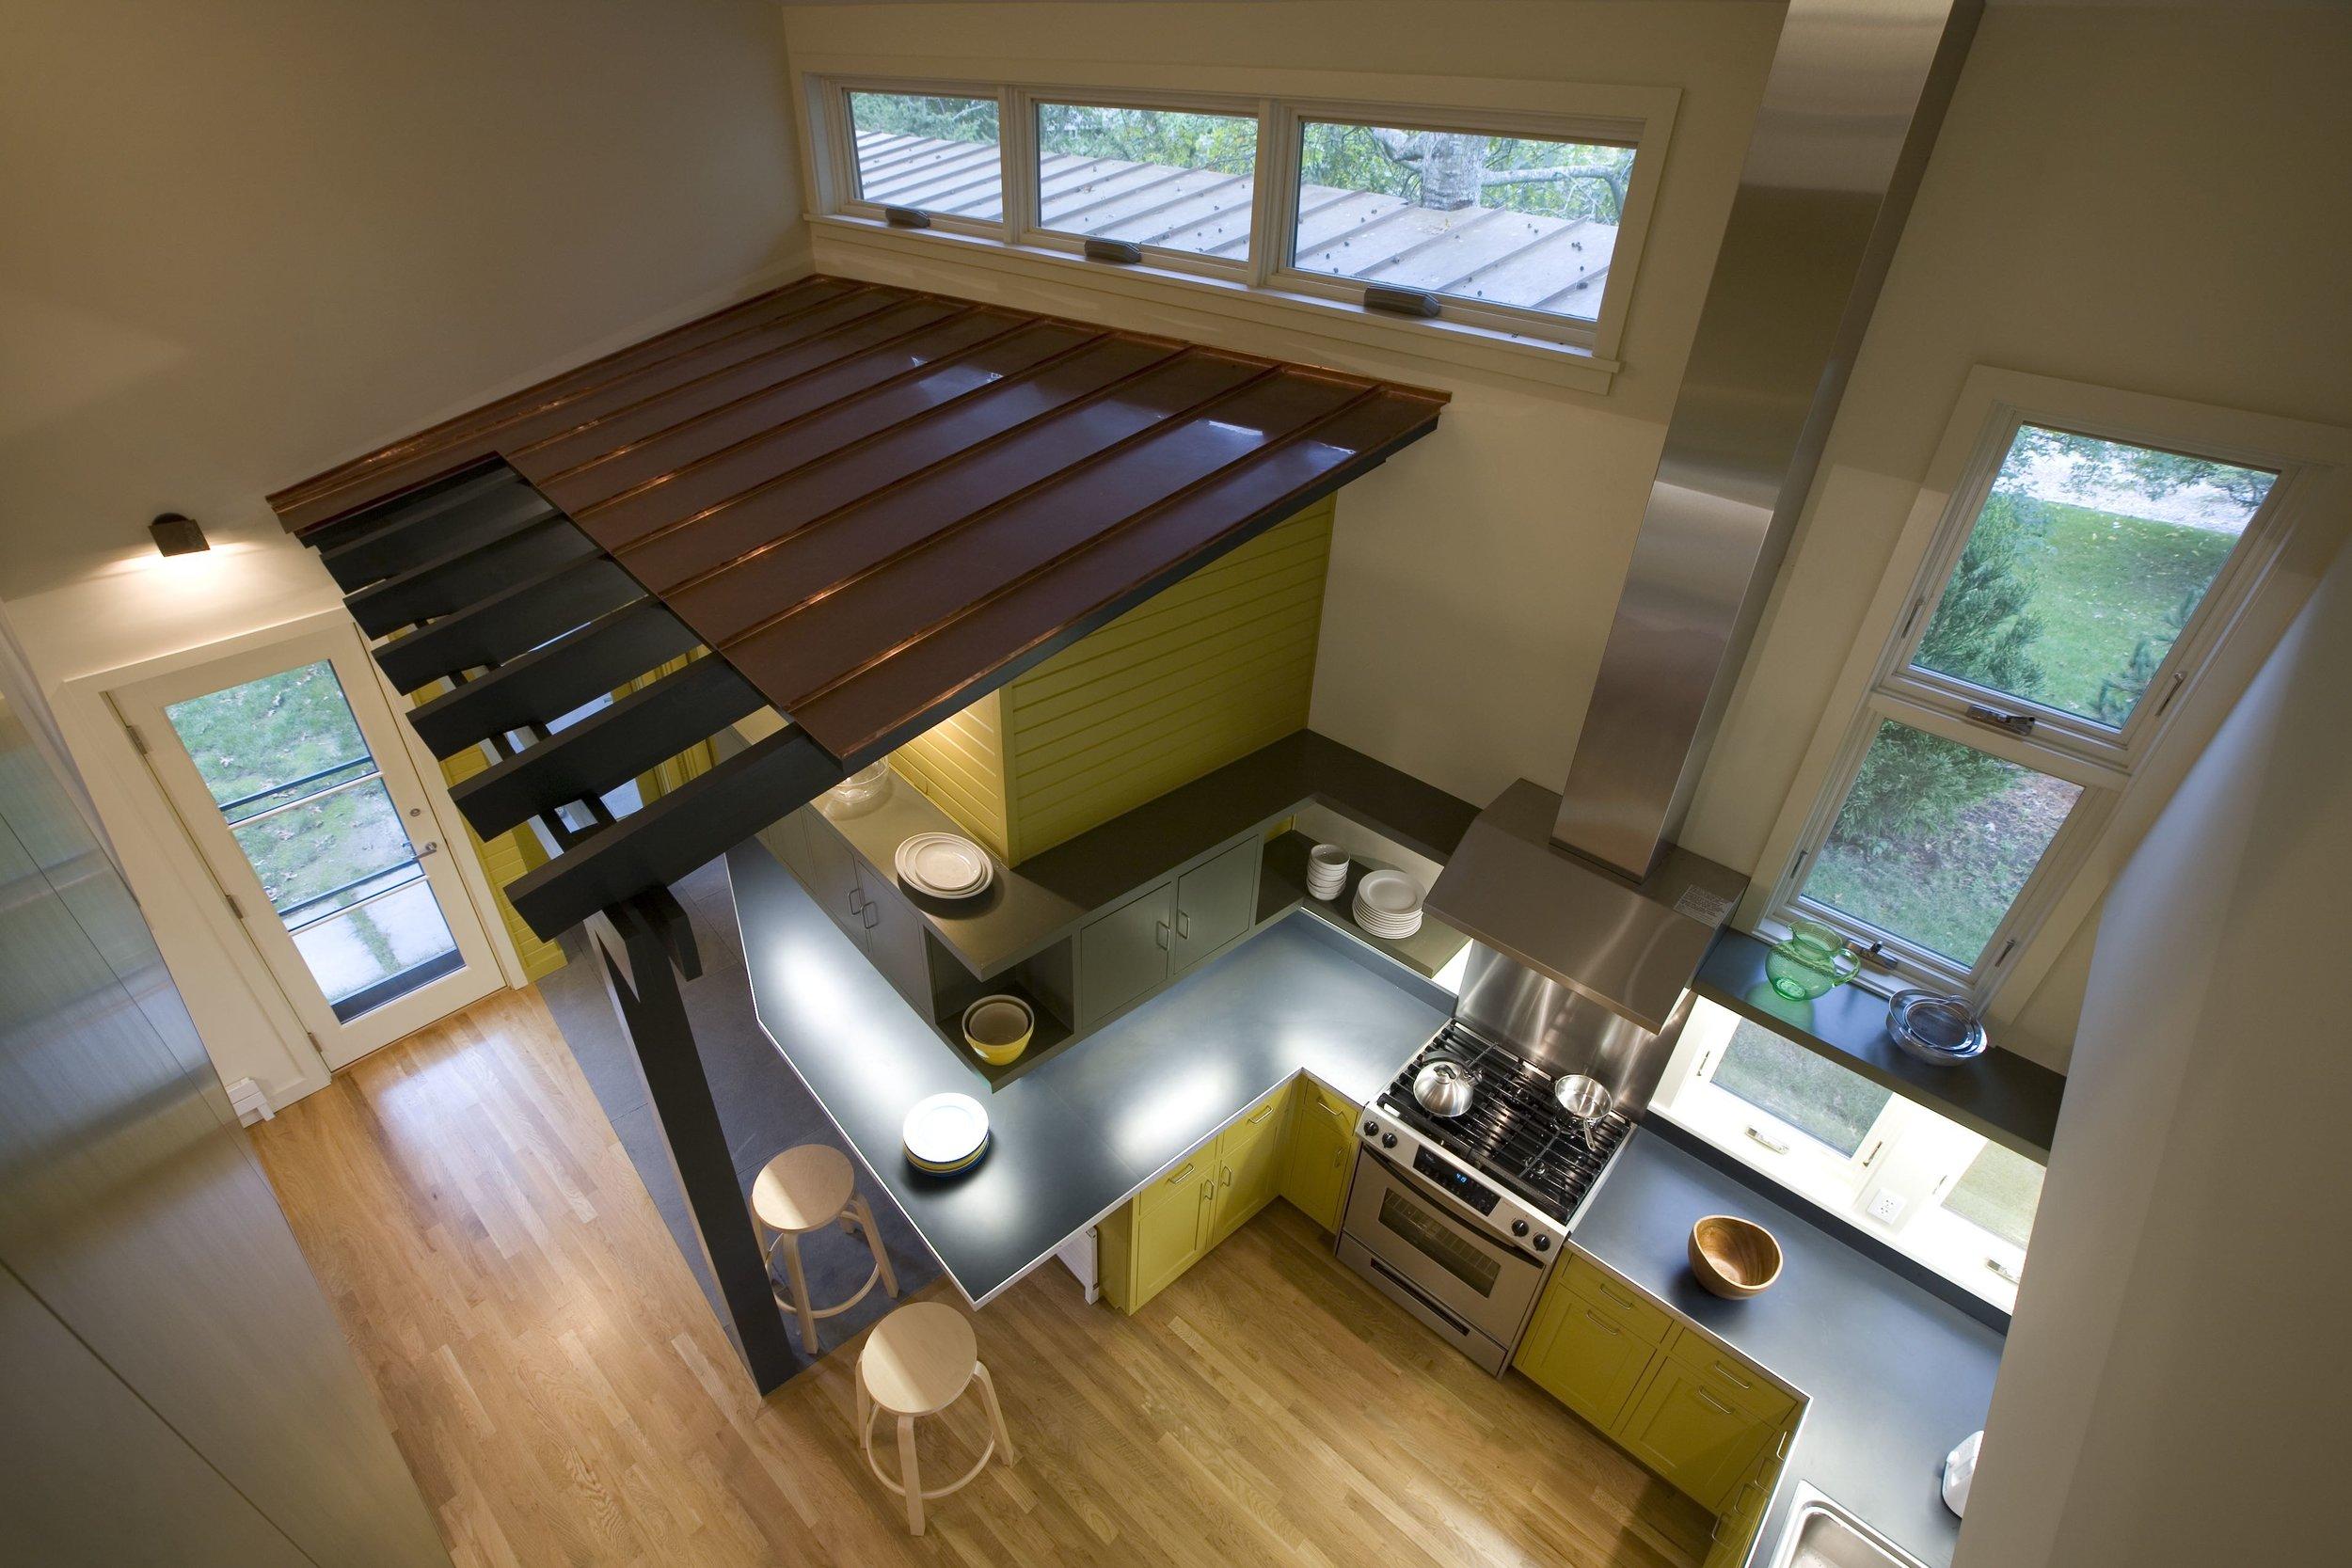 13 AVISNQ_GH_PV_INT_06 kitchen from above.jpg